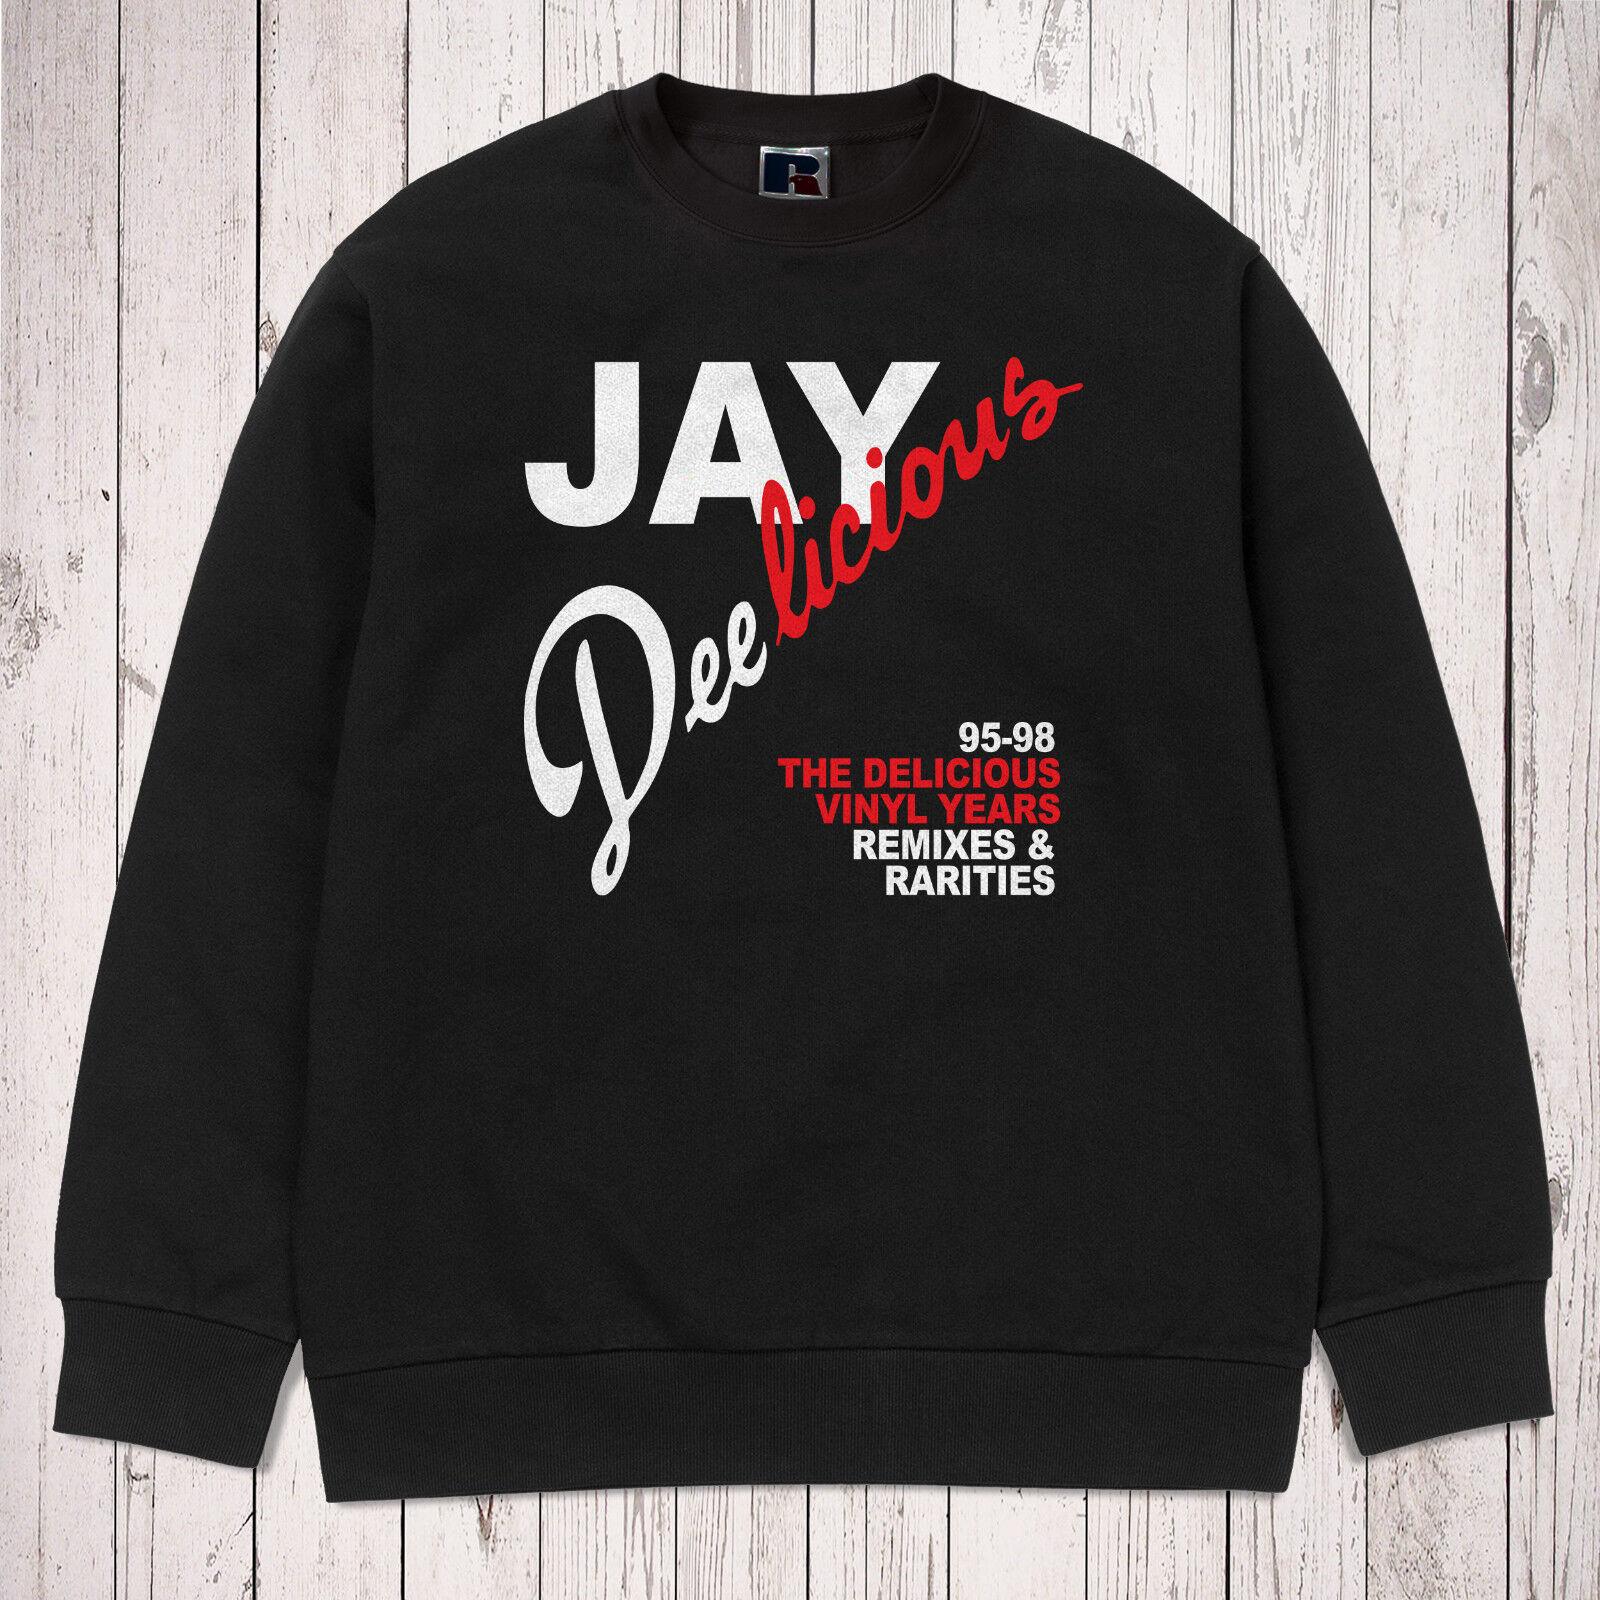 Jay Deelicious J Dilla Sweatshirt - Supreme Hip Hop Streetwear Pullover